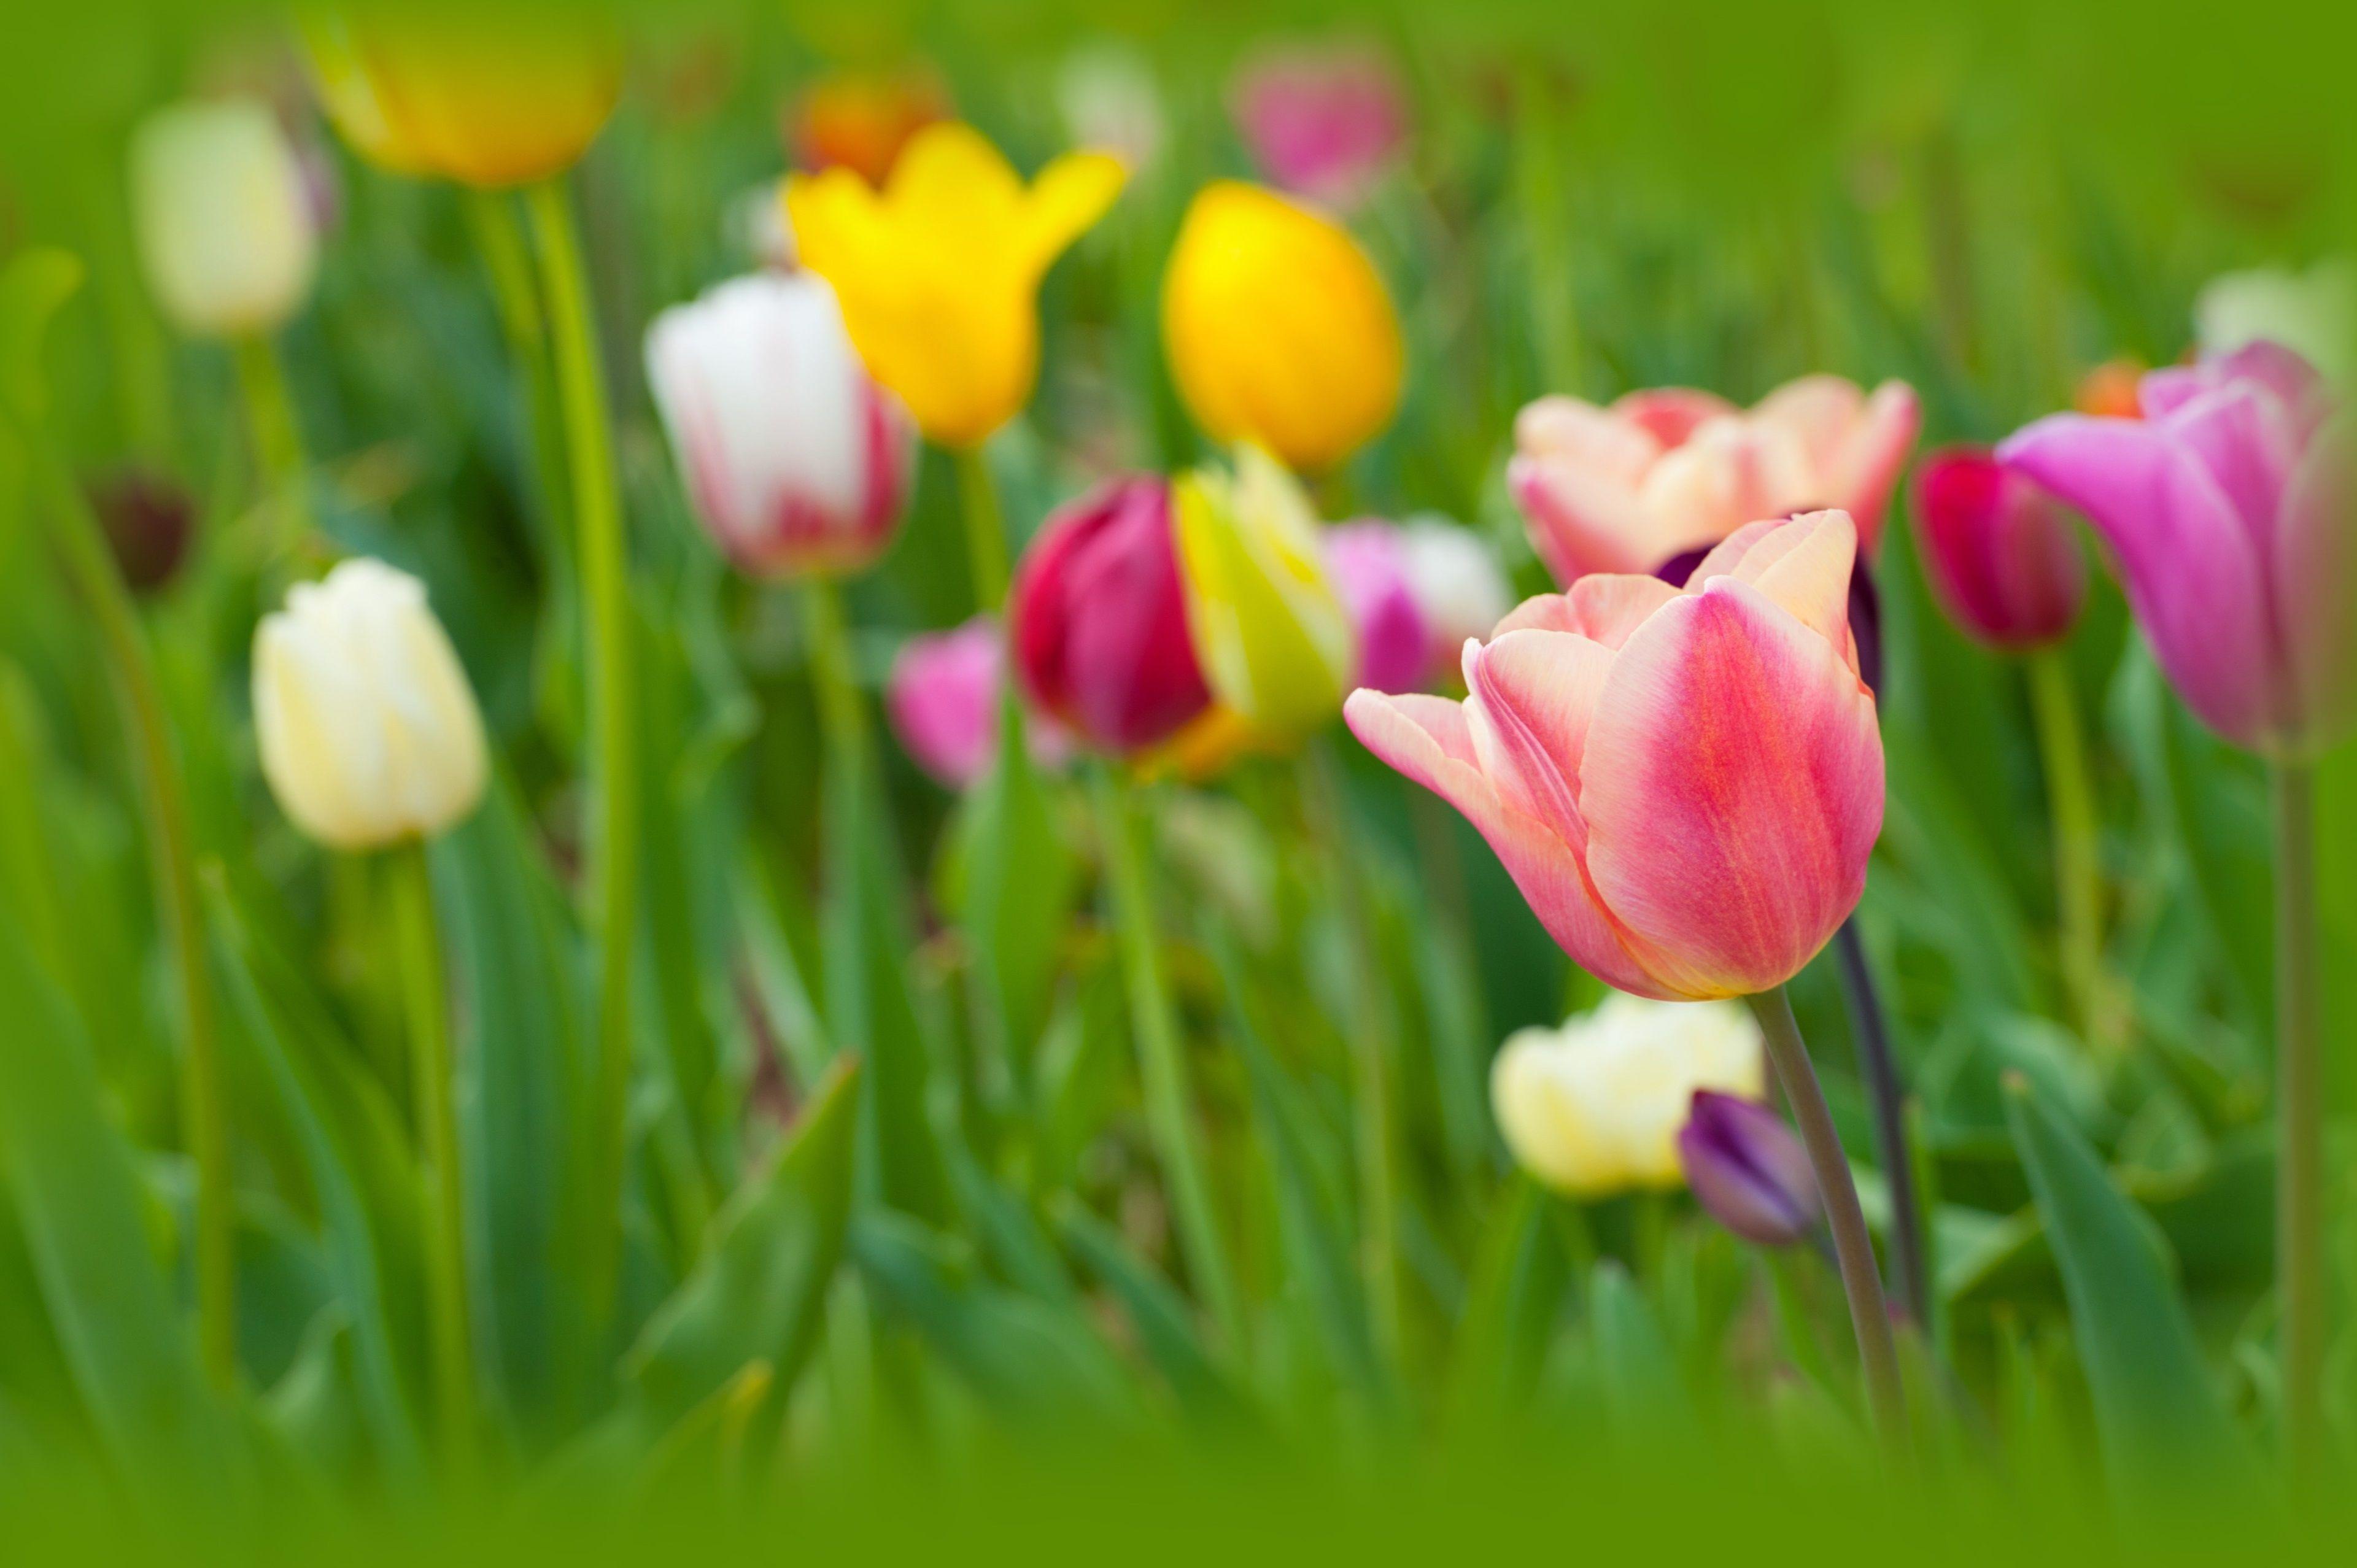 3840x2555 tulips 4k desktop wallpaper hd widescreen Best